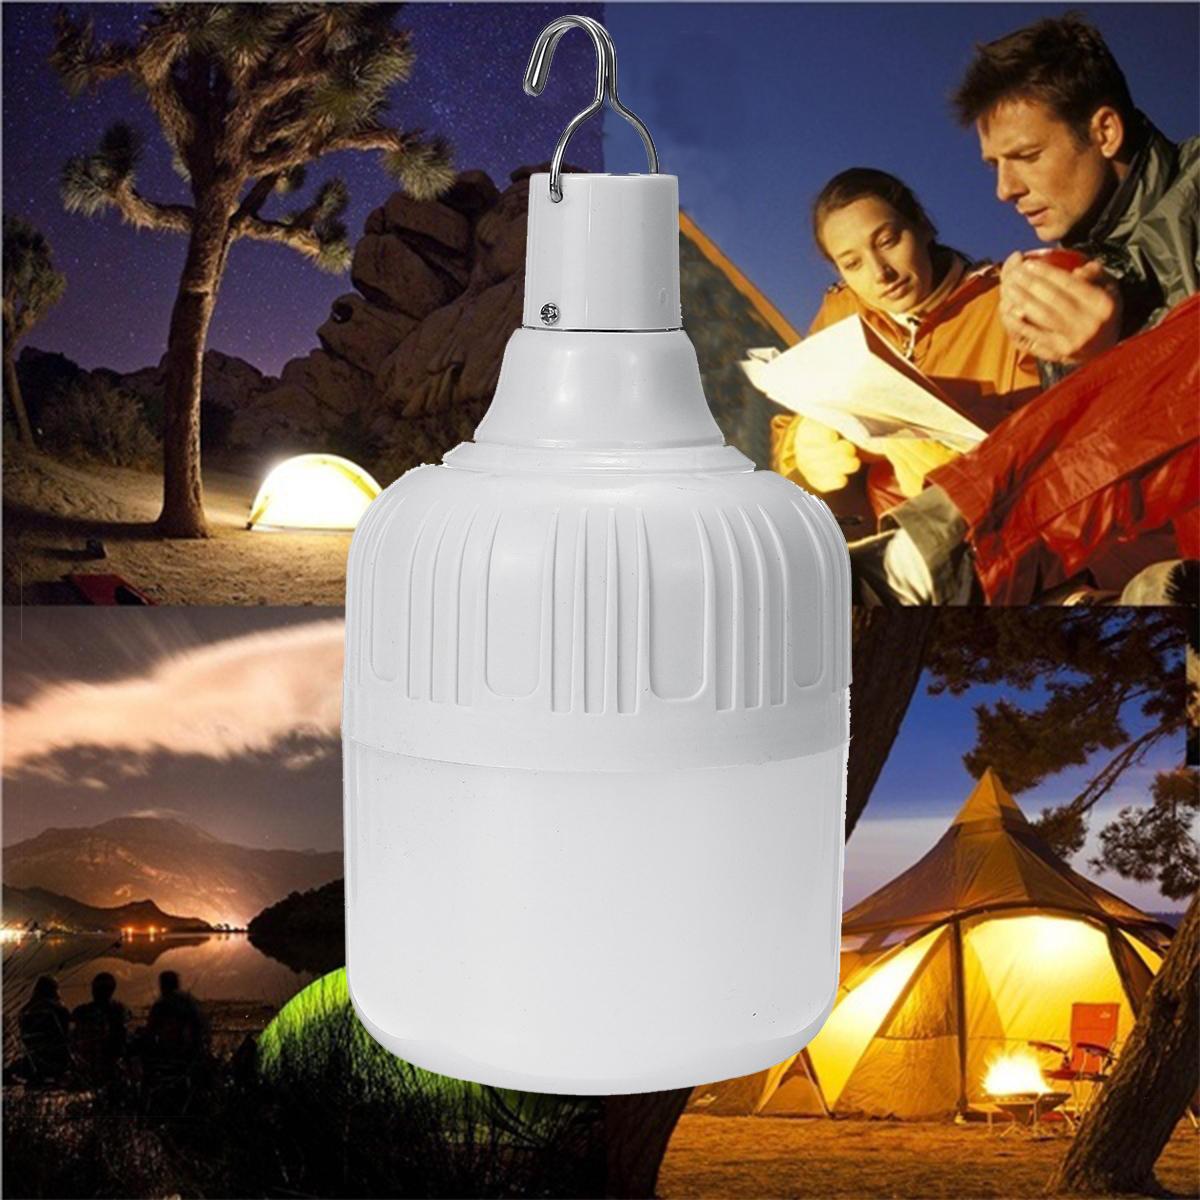 Lampadina bianca ricaricabile di emergenza SMD 5630 luce a led 9W 15W 24W 36W USB per esterni campeggio